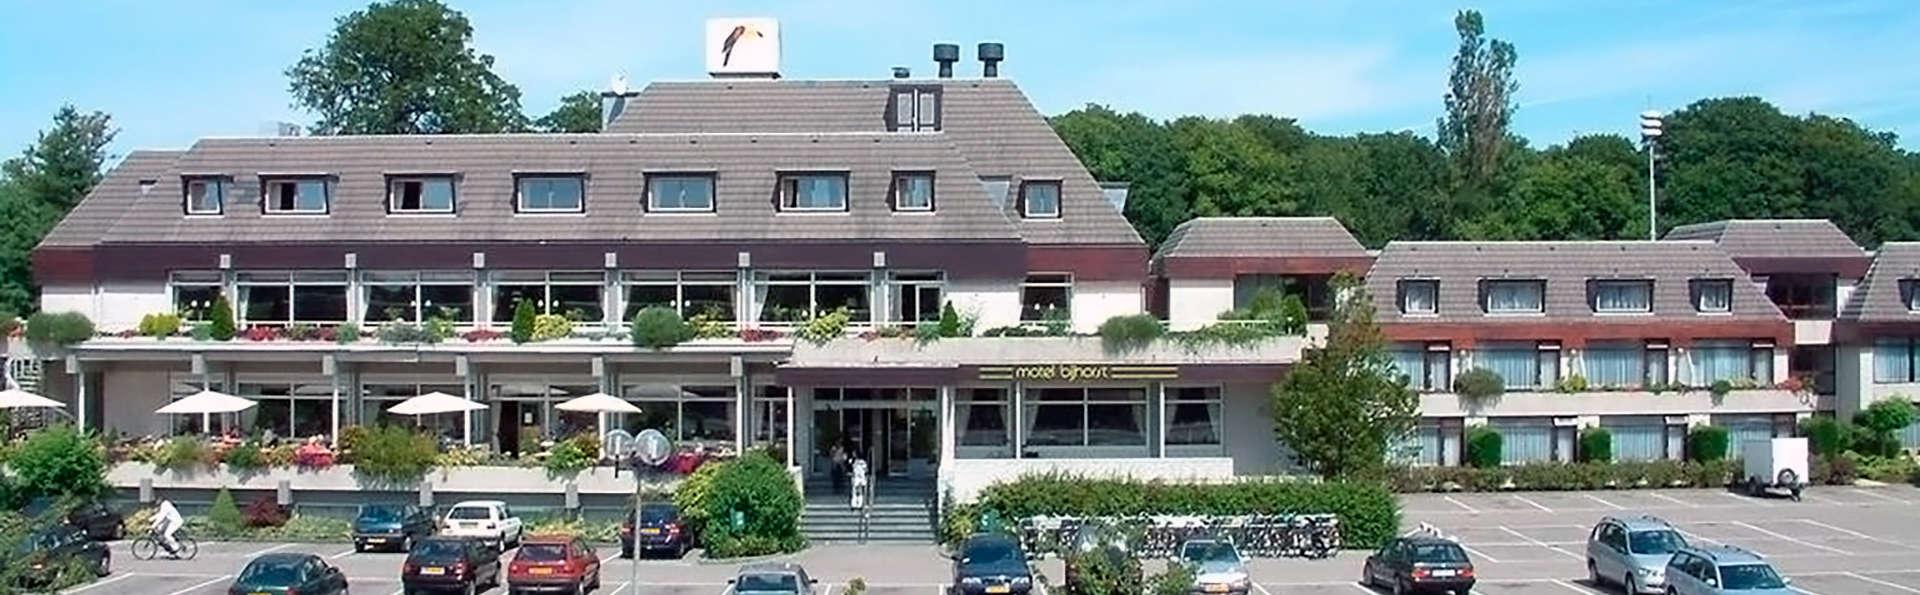 Hotel Van der Valk Den Haag Wassenaar - Edit_Front.jpg